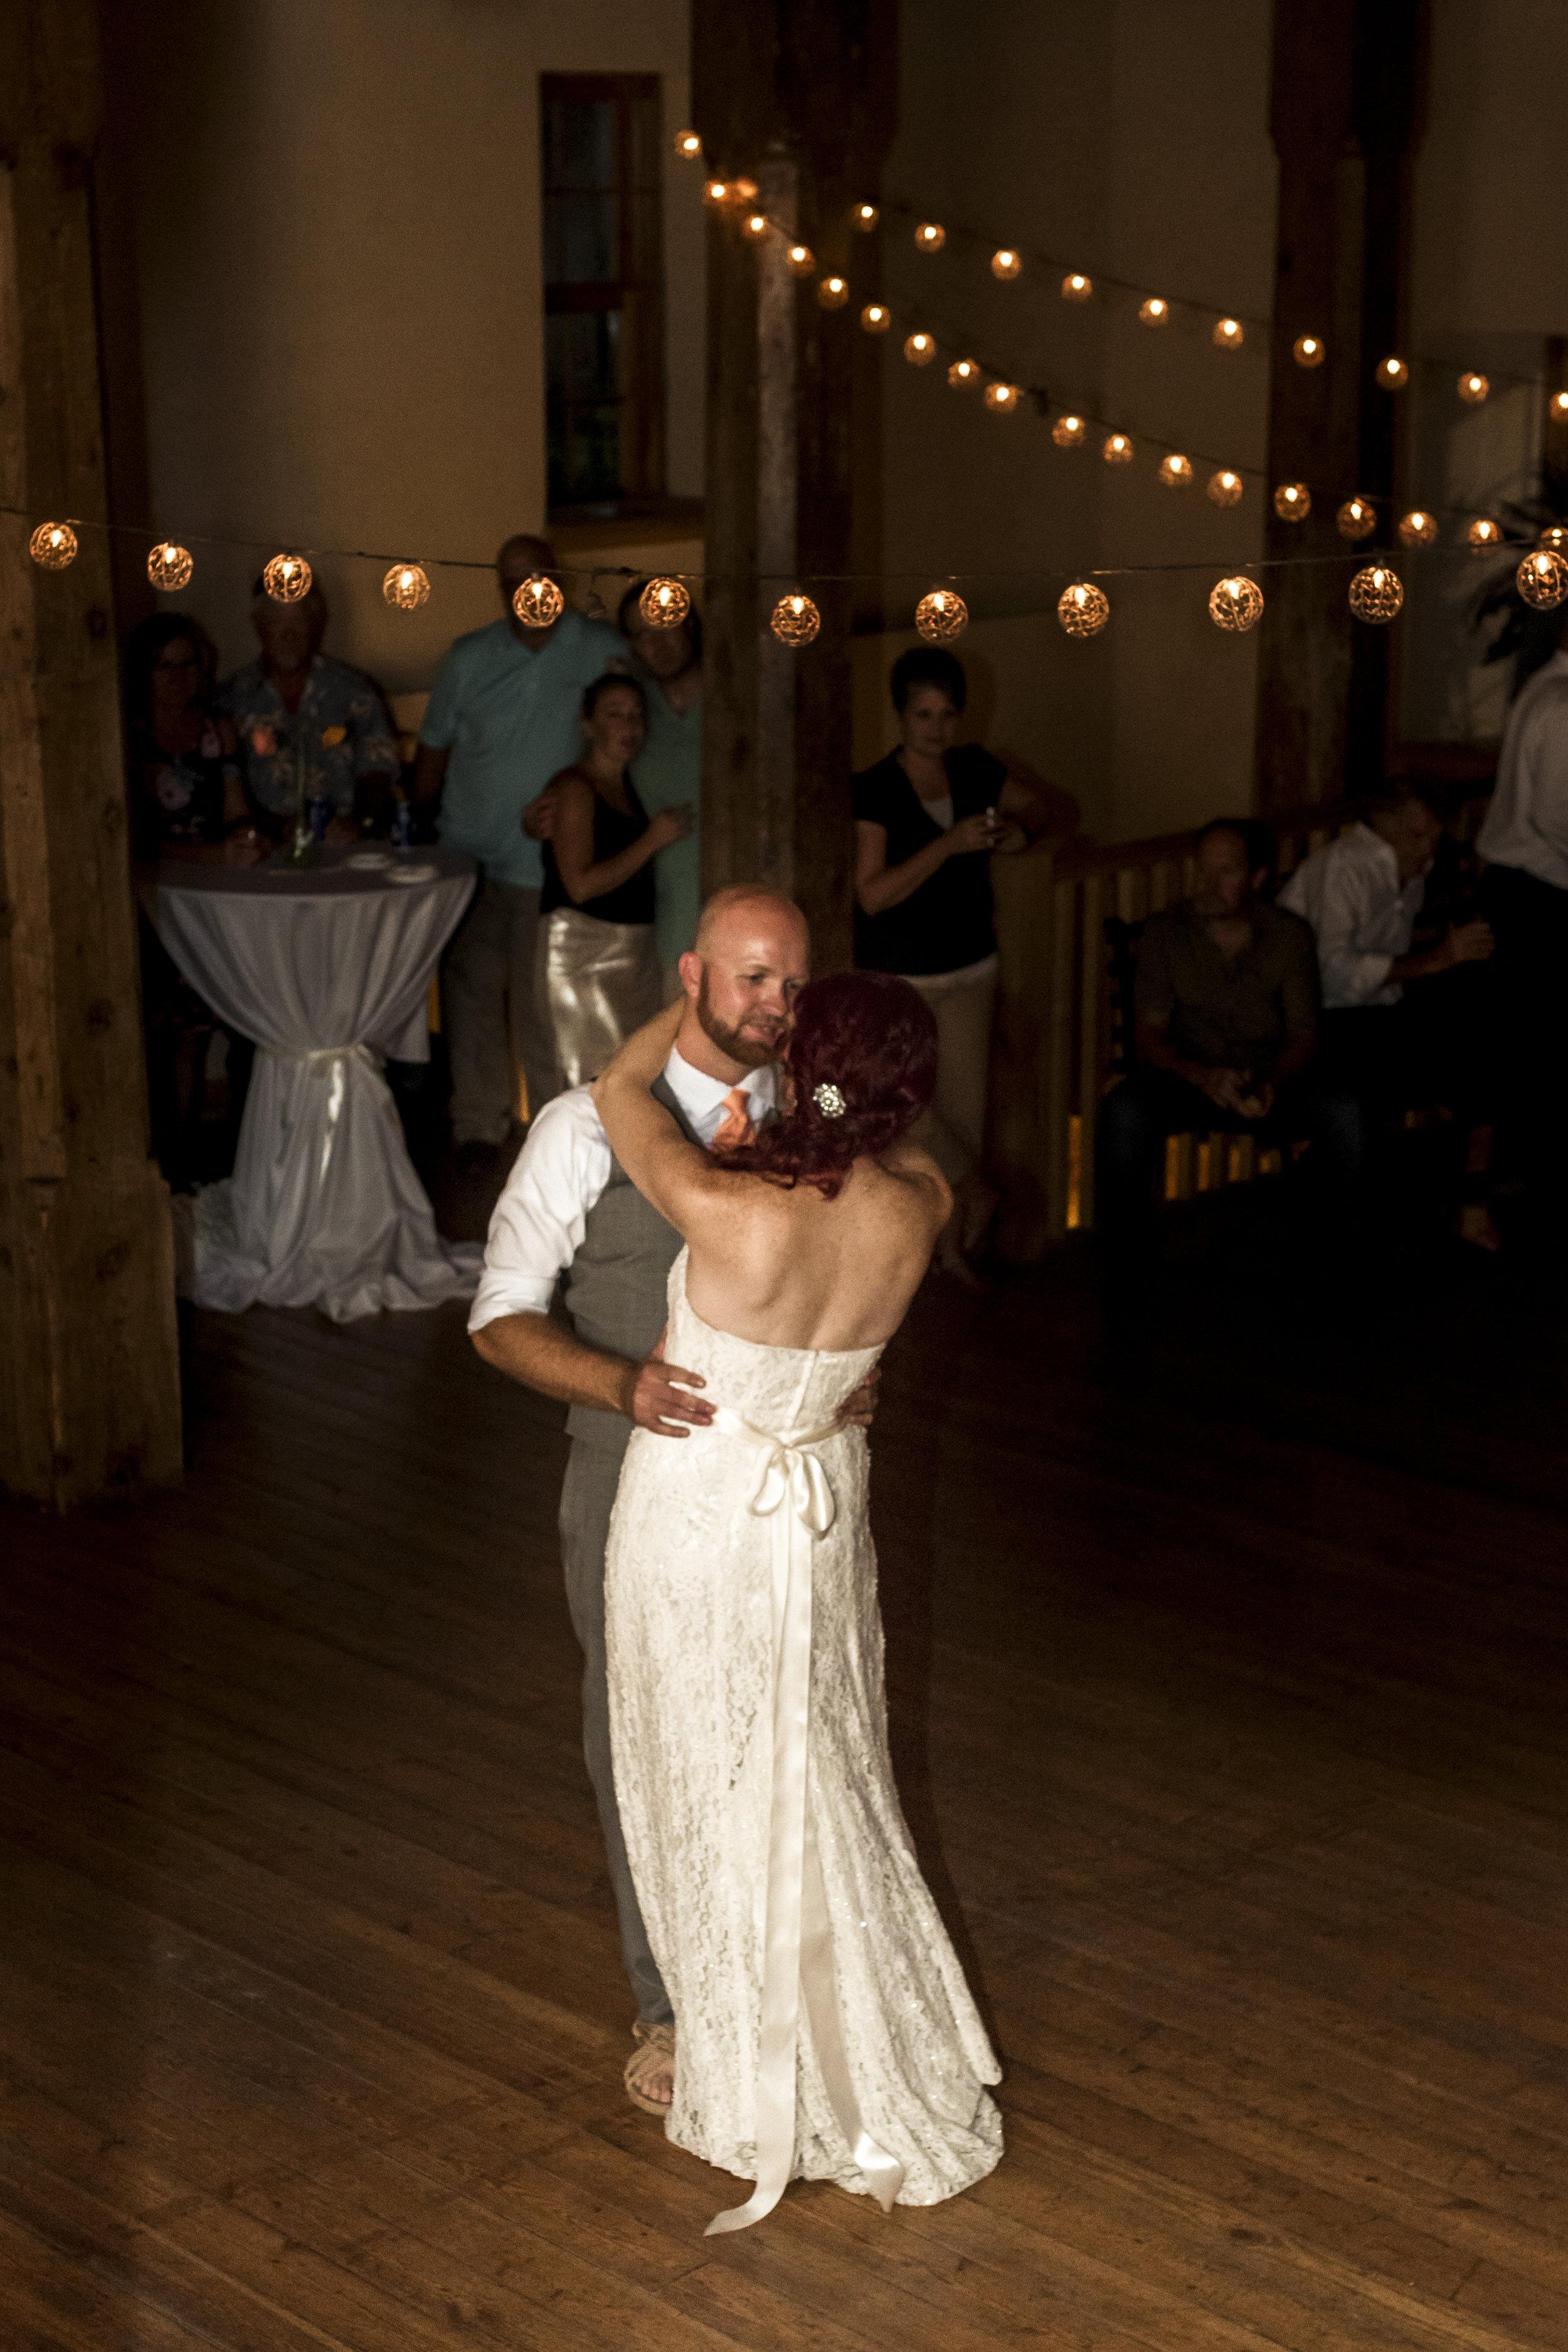 BBPhotoUtah summer wedding receptionOld Chase Mill04.JPG